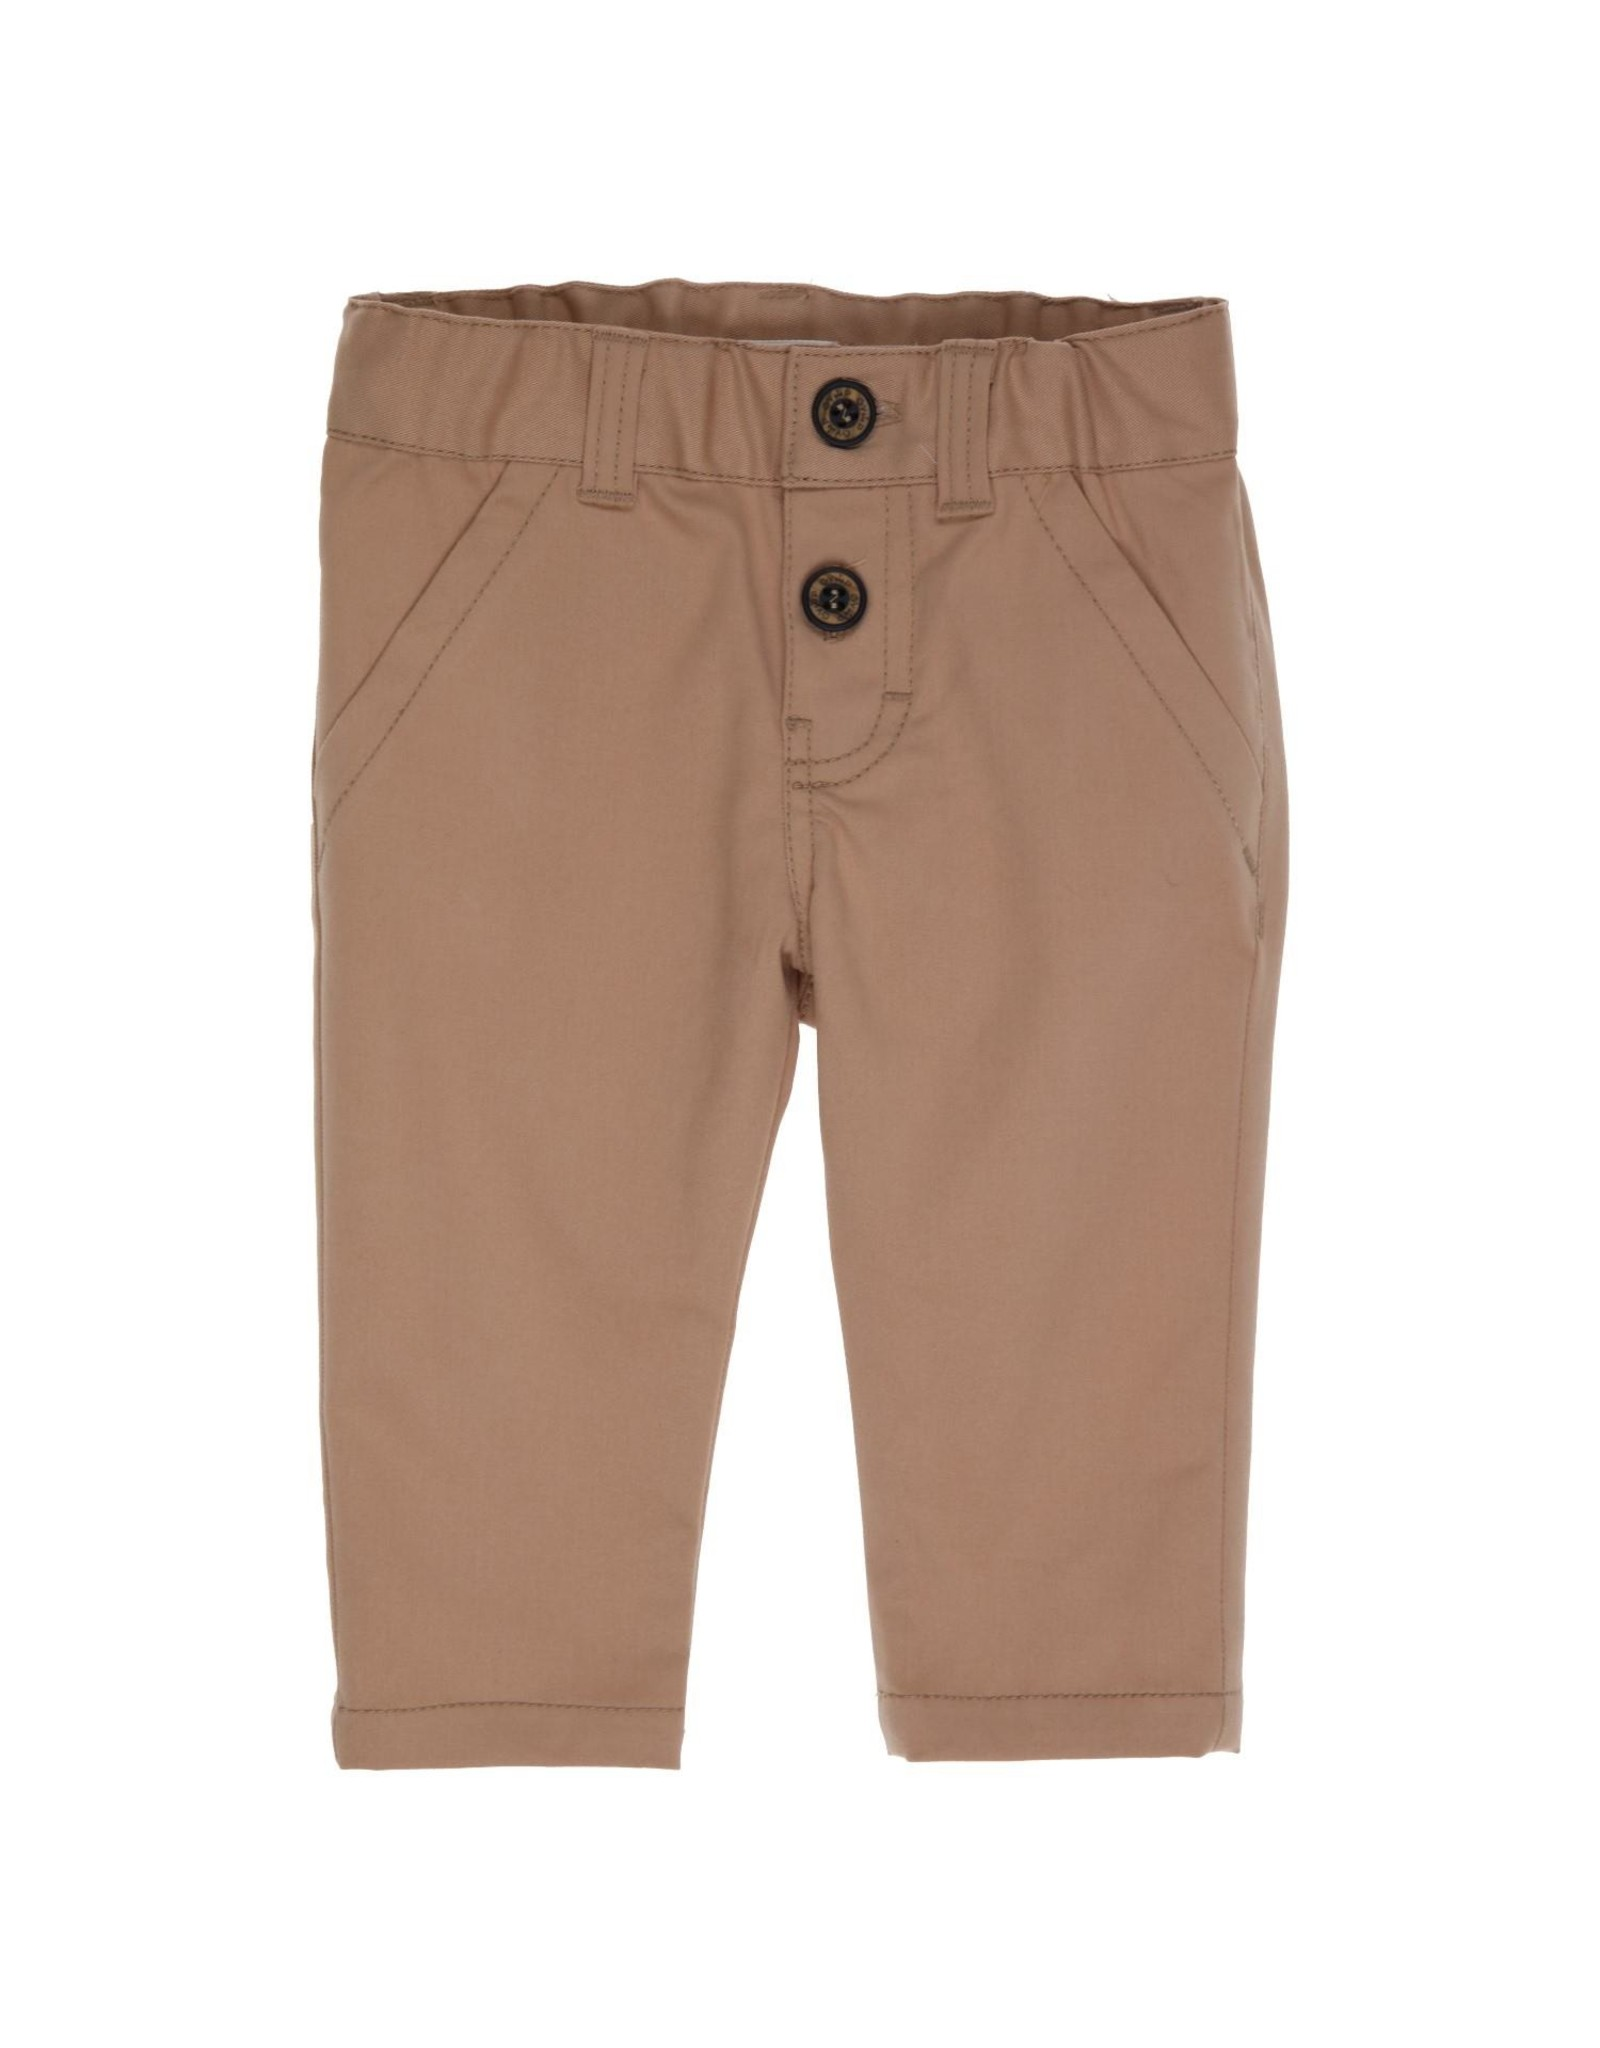 Gymp pantalon - classic - beaufort  beige